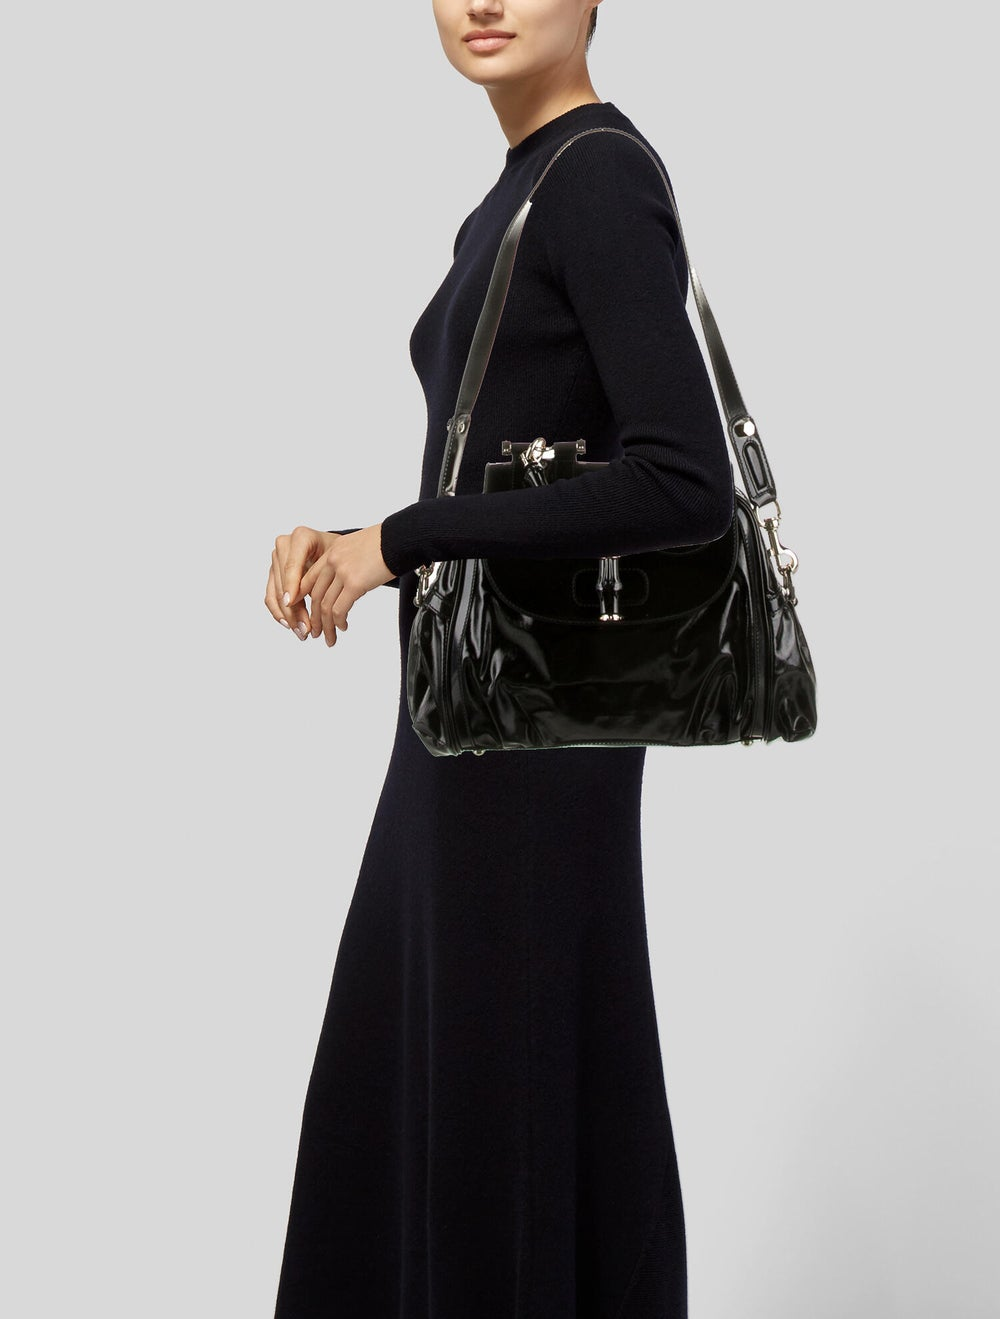 Gucci Pop Bamboo Handle Bag Black - image 2